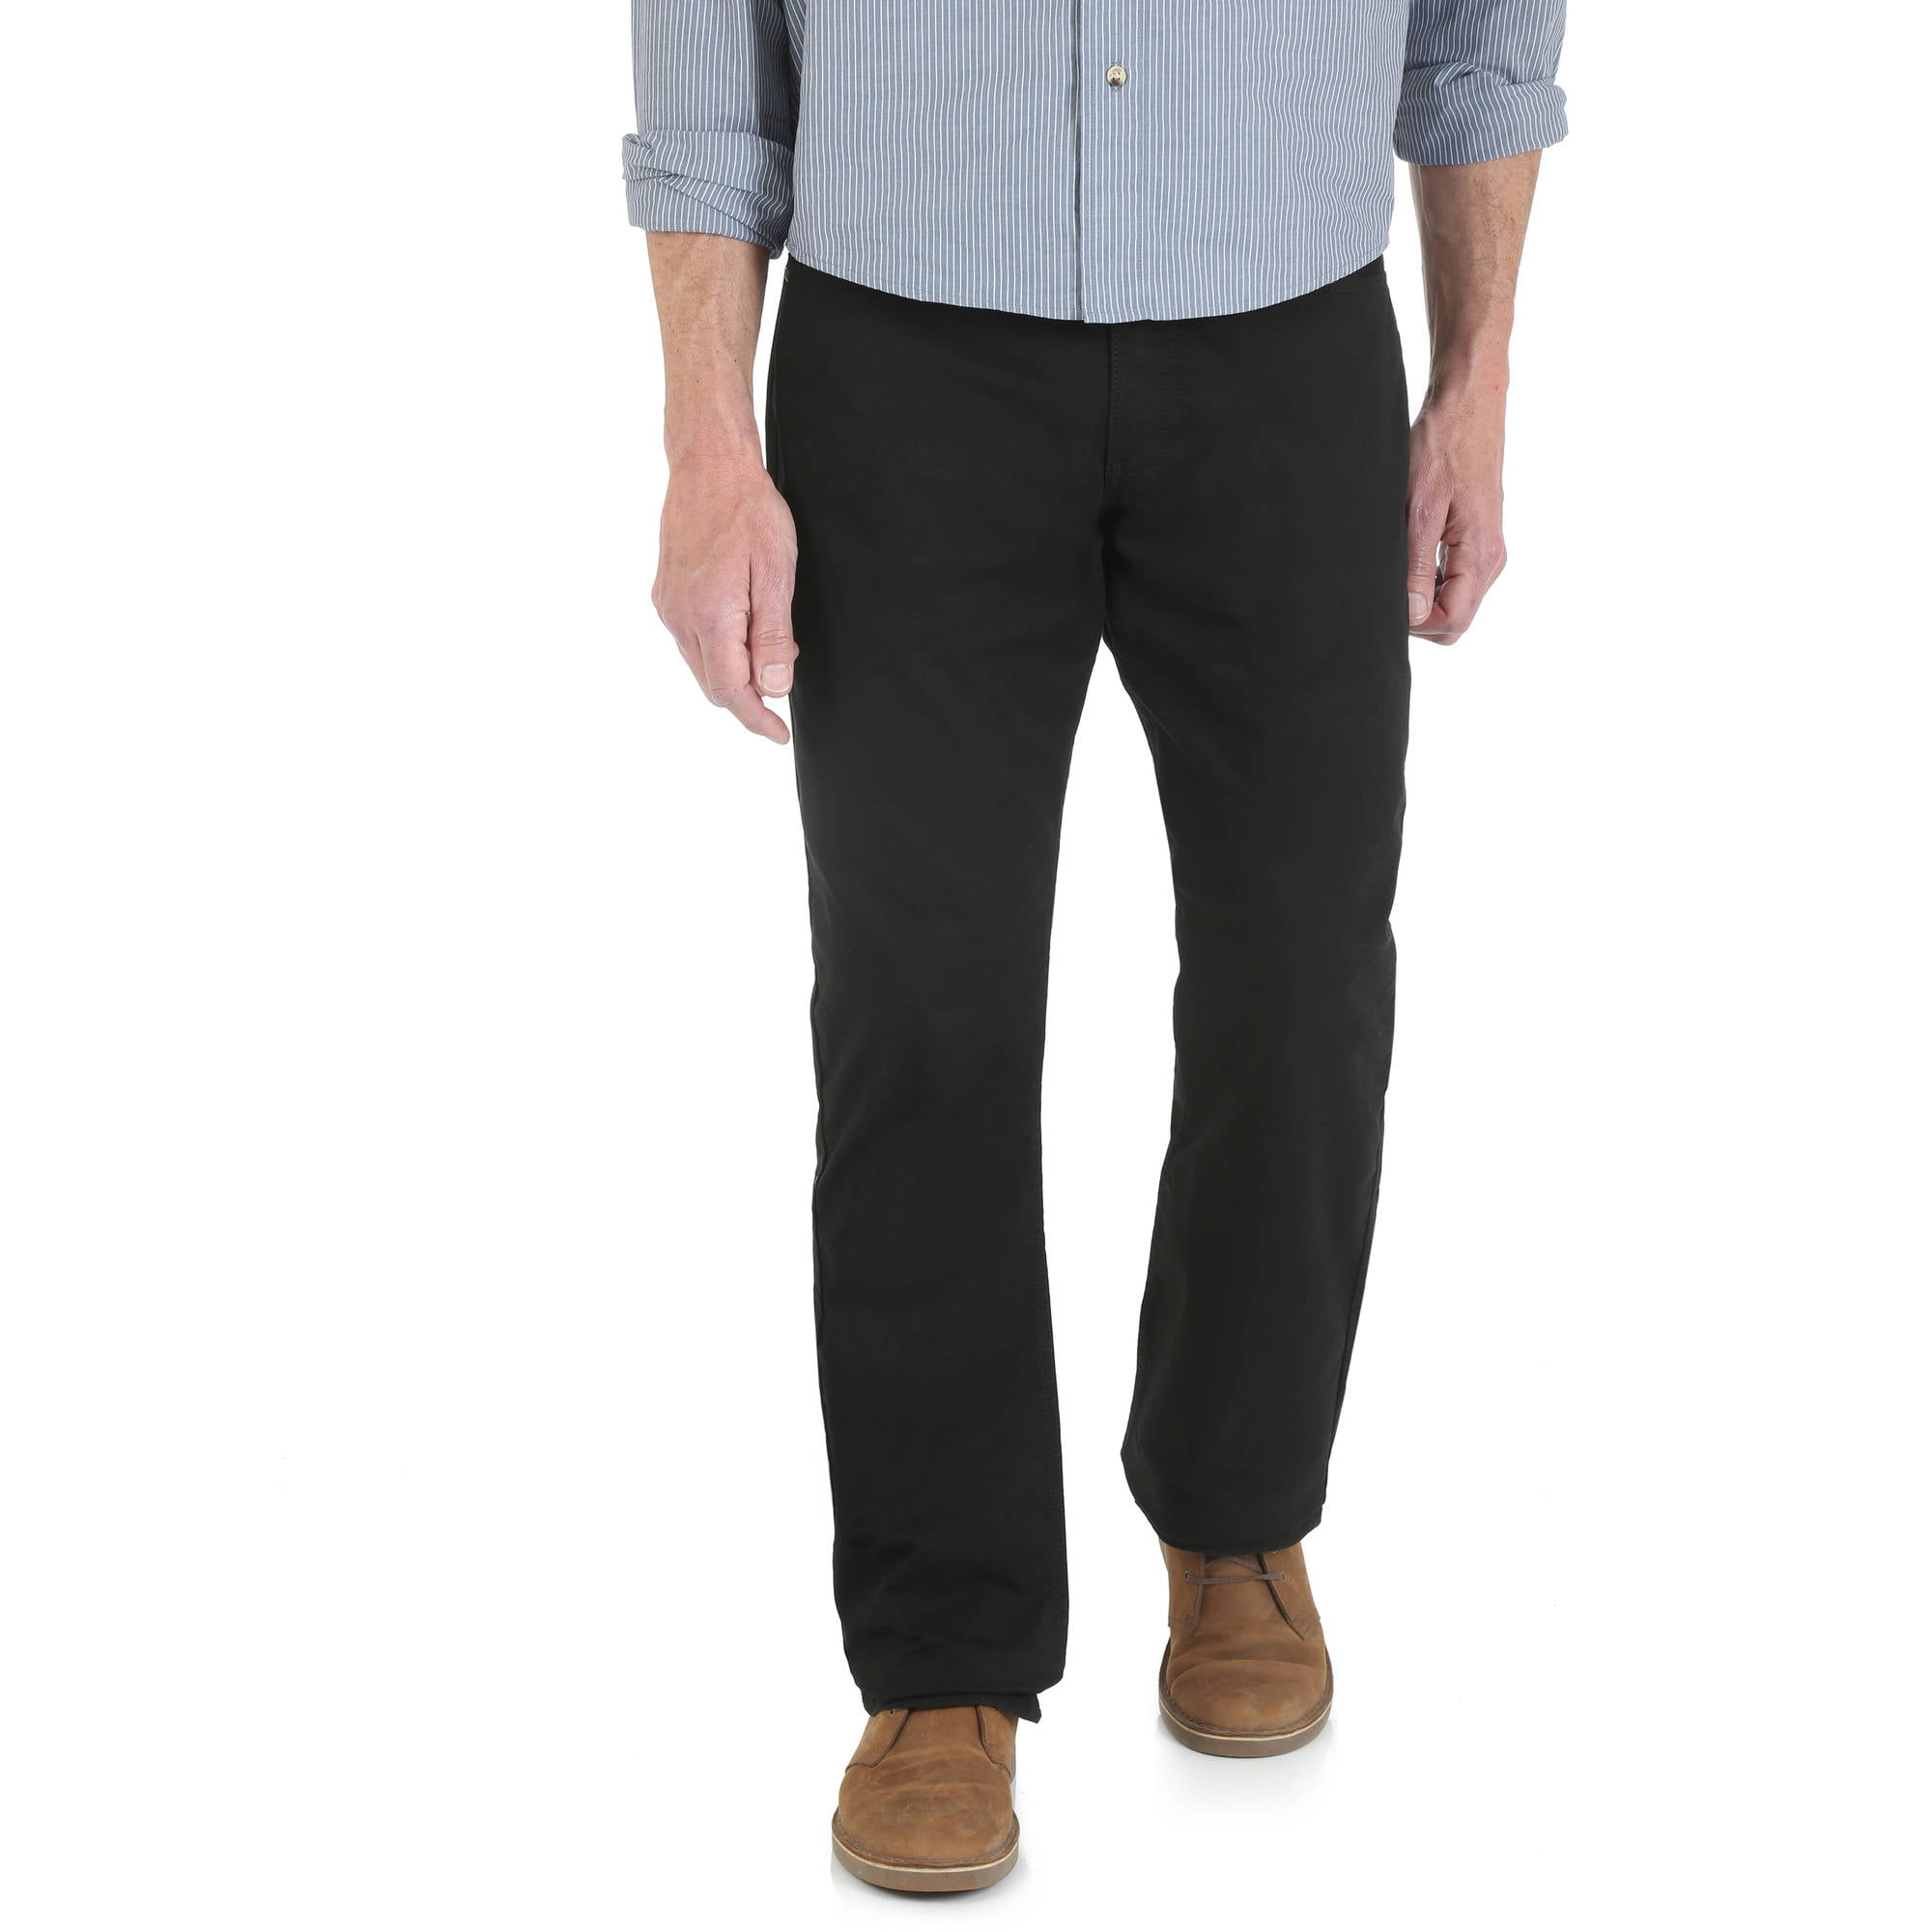 Big Star Union Comfort Straight Fit Jeans